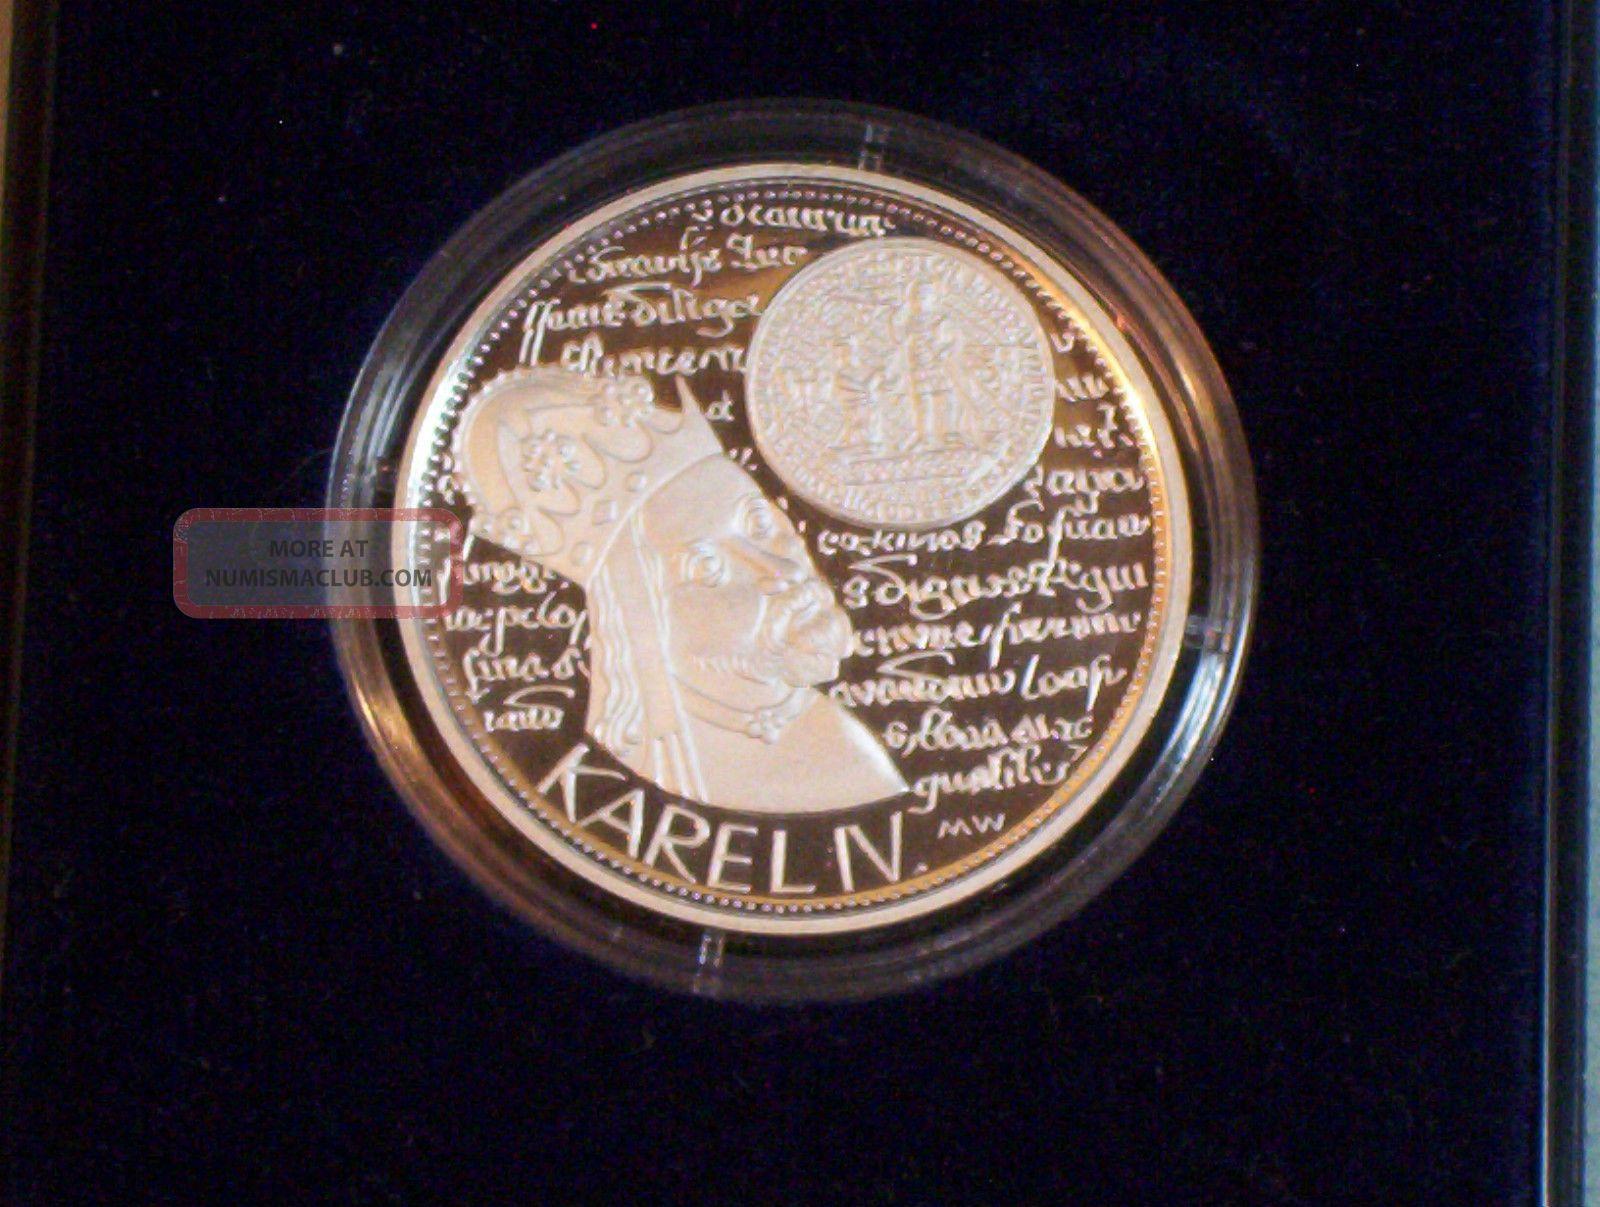 1998 Czech Republic 200 Korun Silver Proof Coin King Charles Iv Czechoslovakia Czech Republic photo